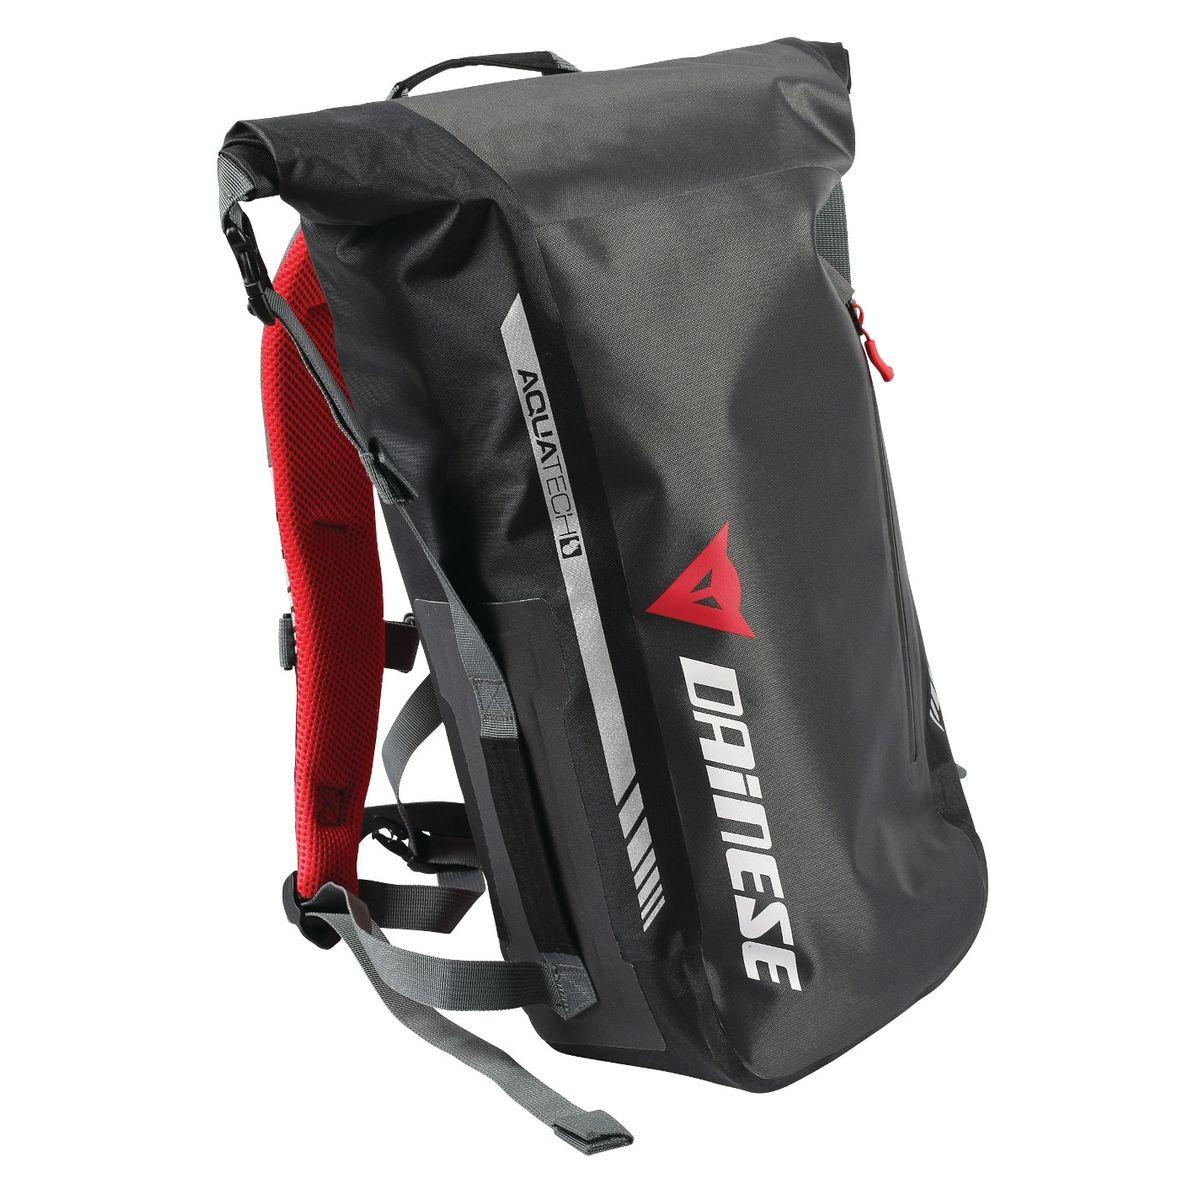 Рюкзак Dainese D-Elements Backpack